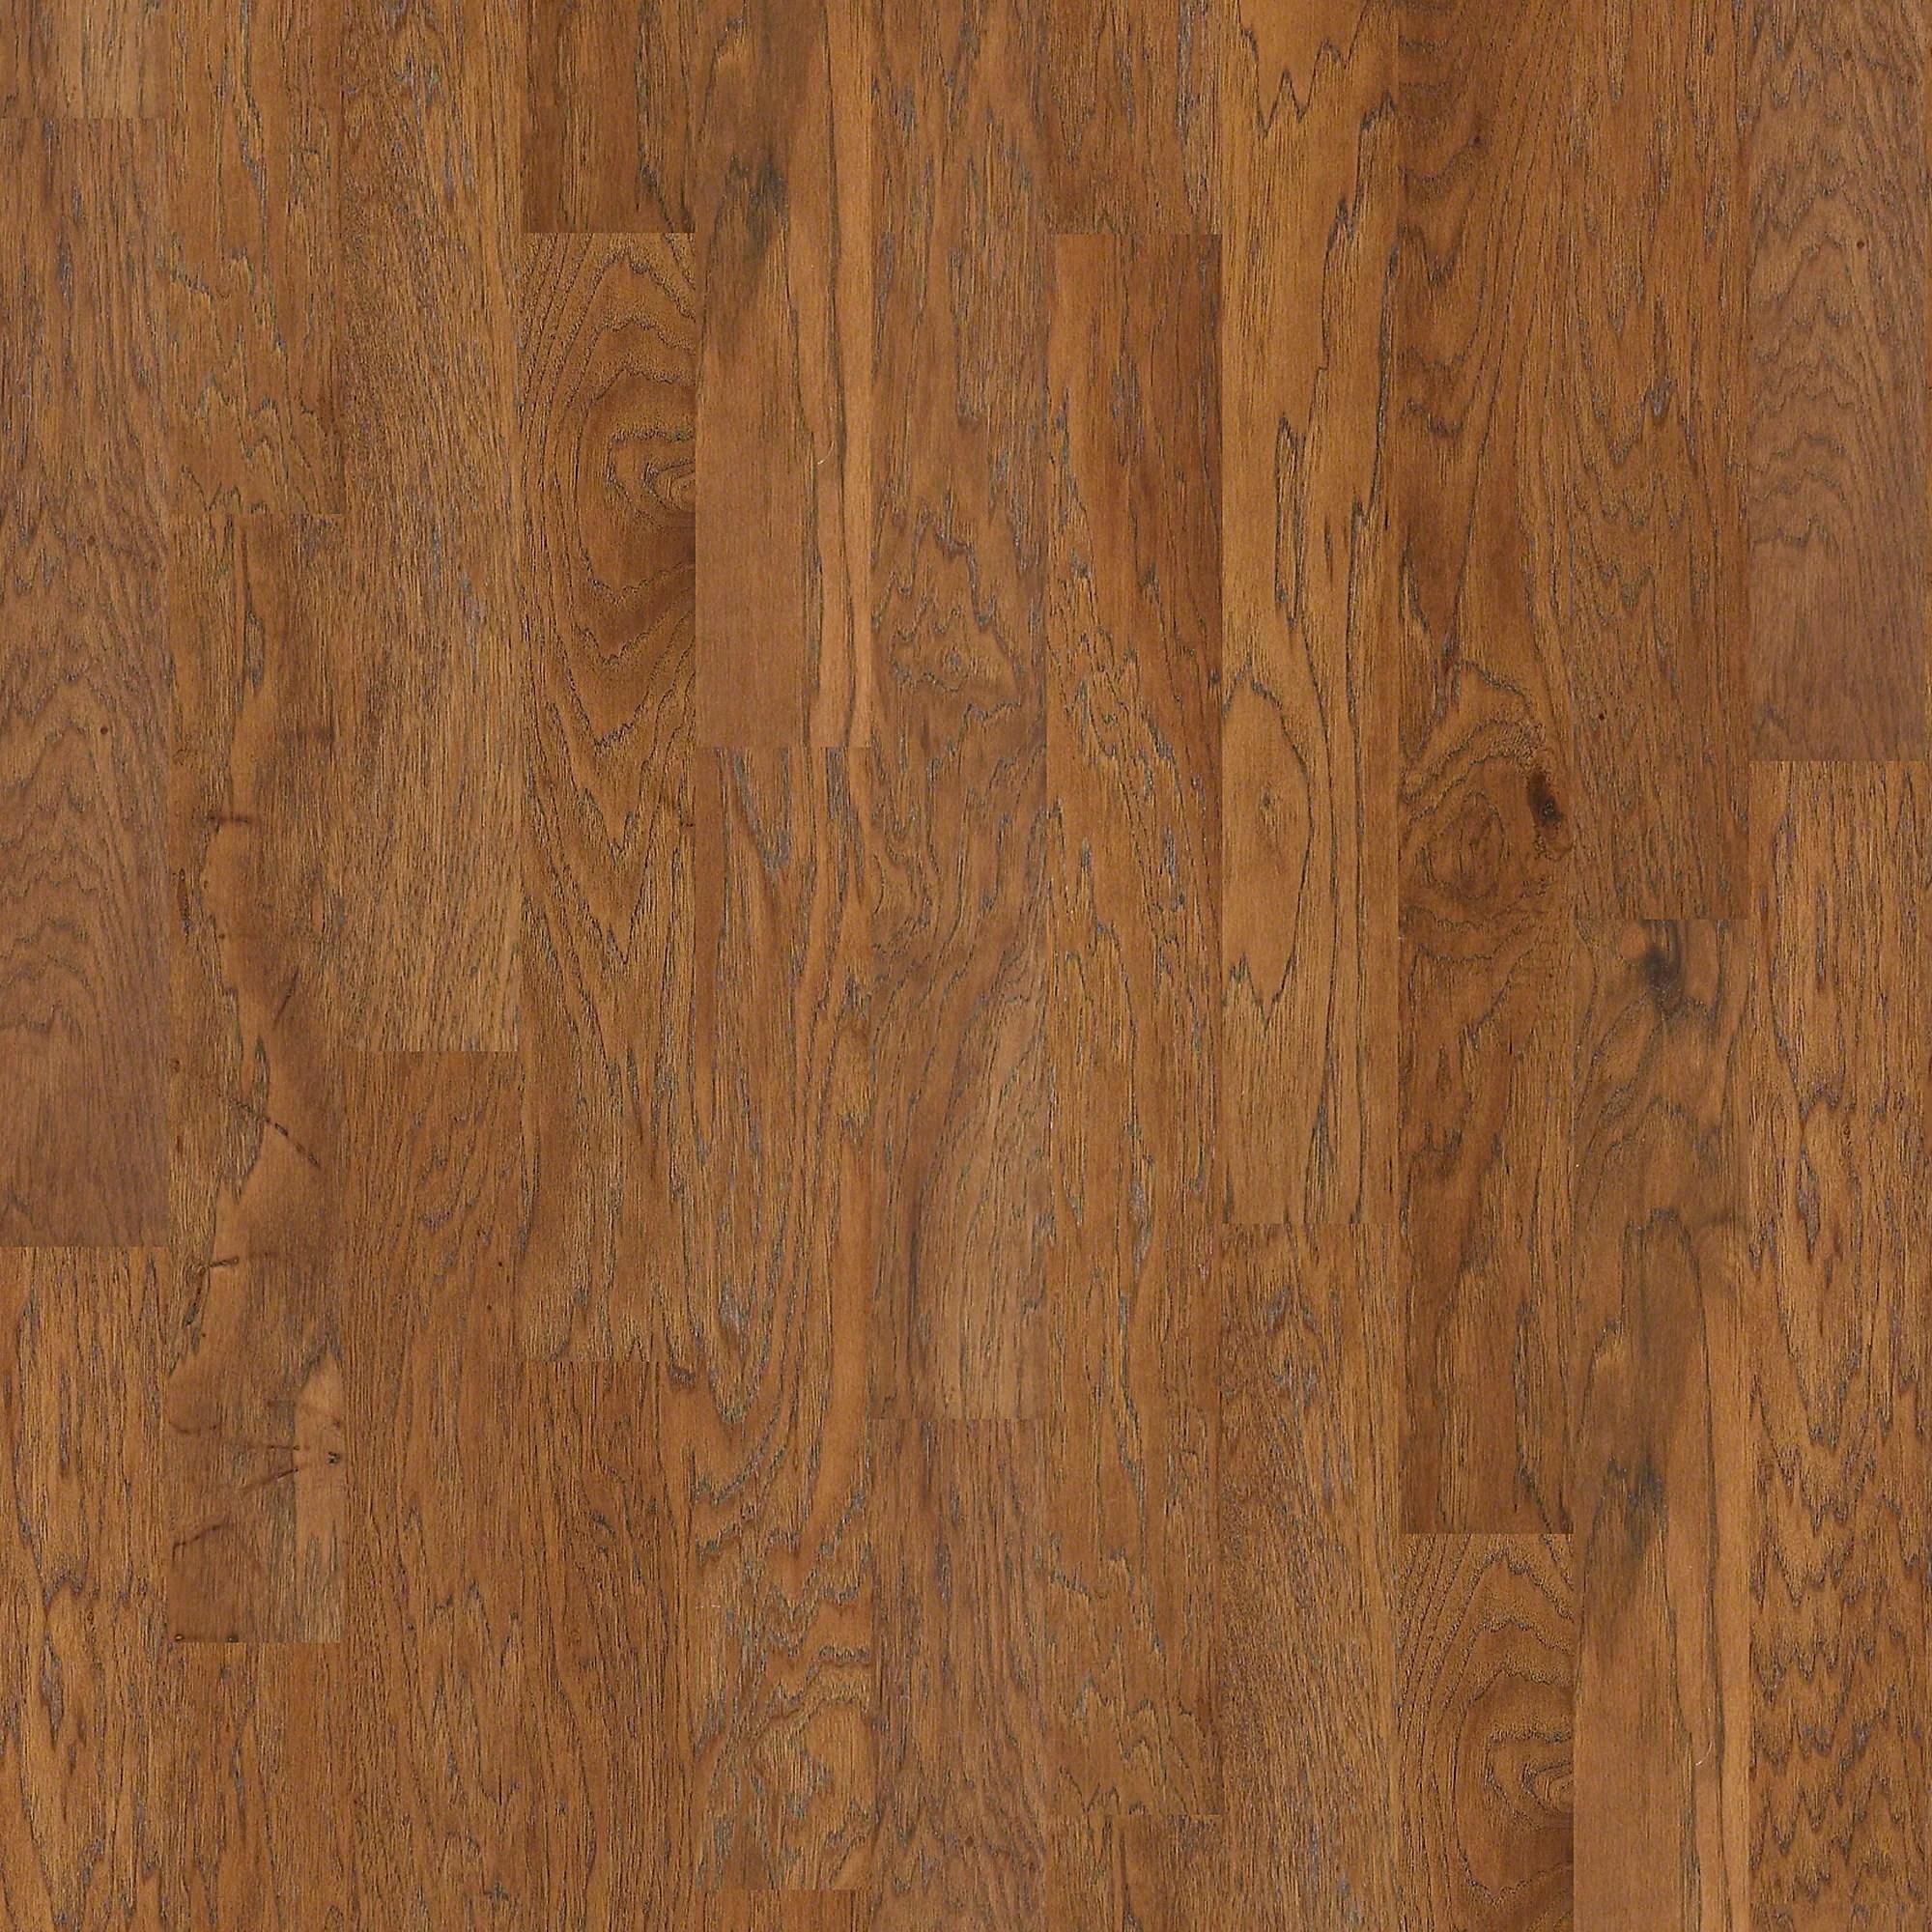 Shaw Floors Victorian Hickory 48 Engineered Hickory